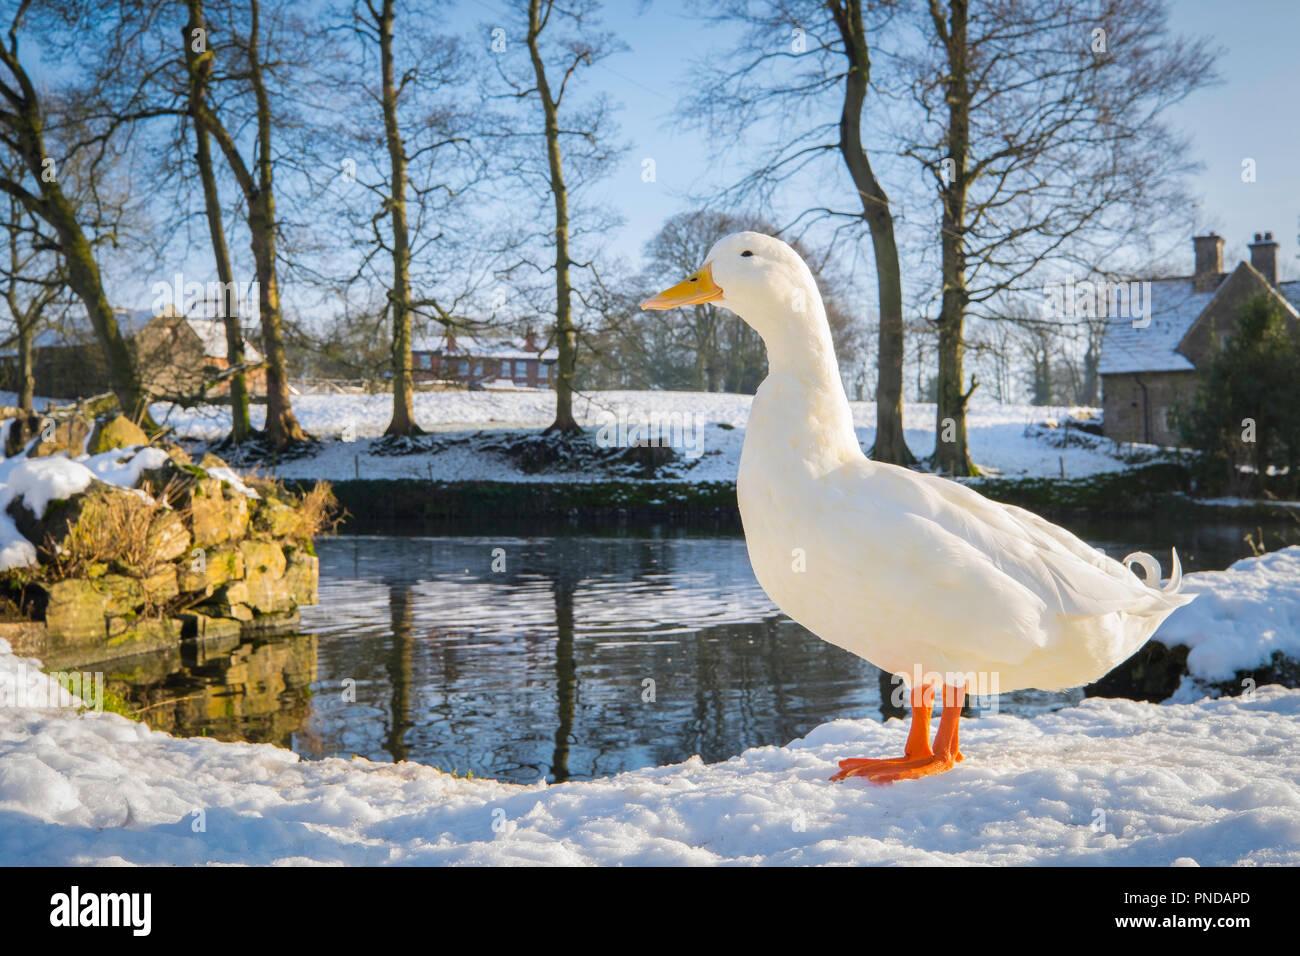 Aylesbury Duck at Tissington, Debyshire. - Stock Image